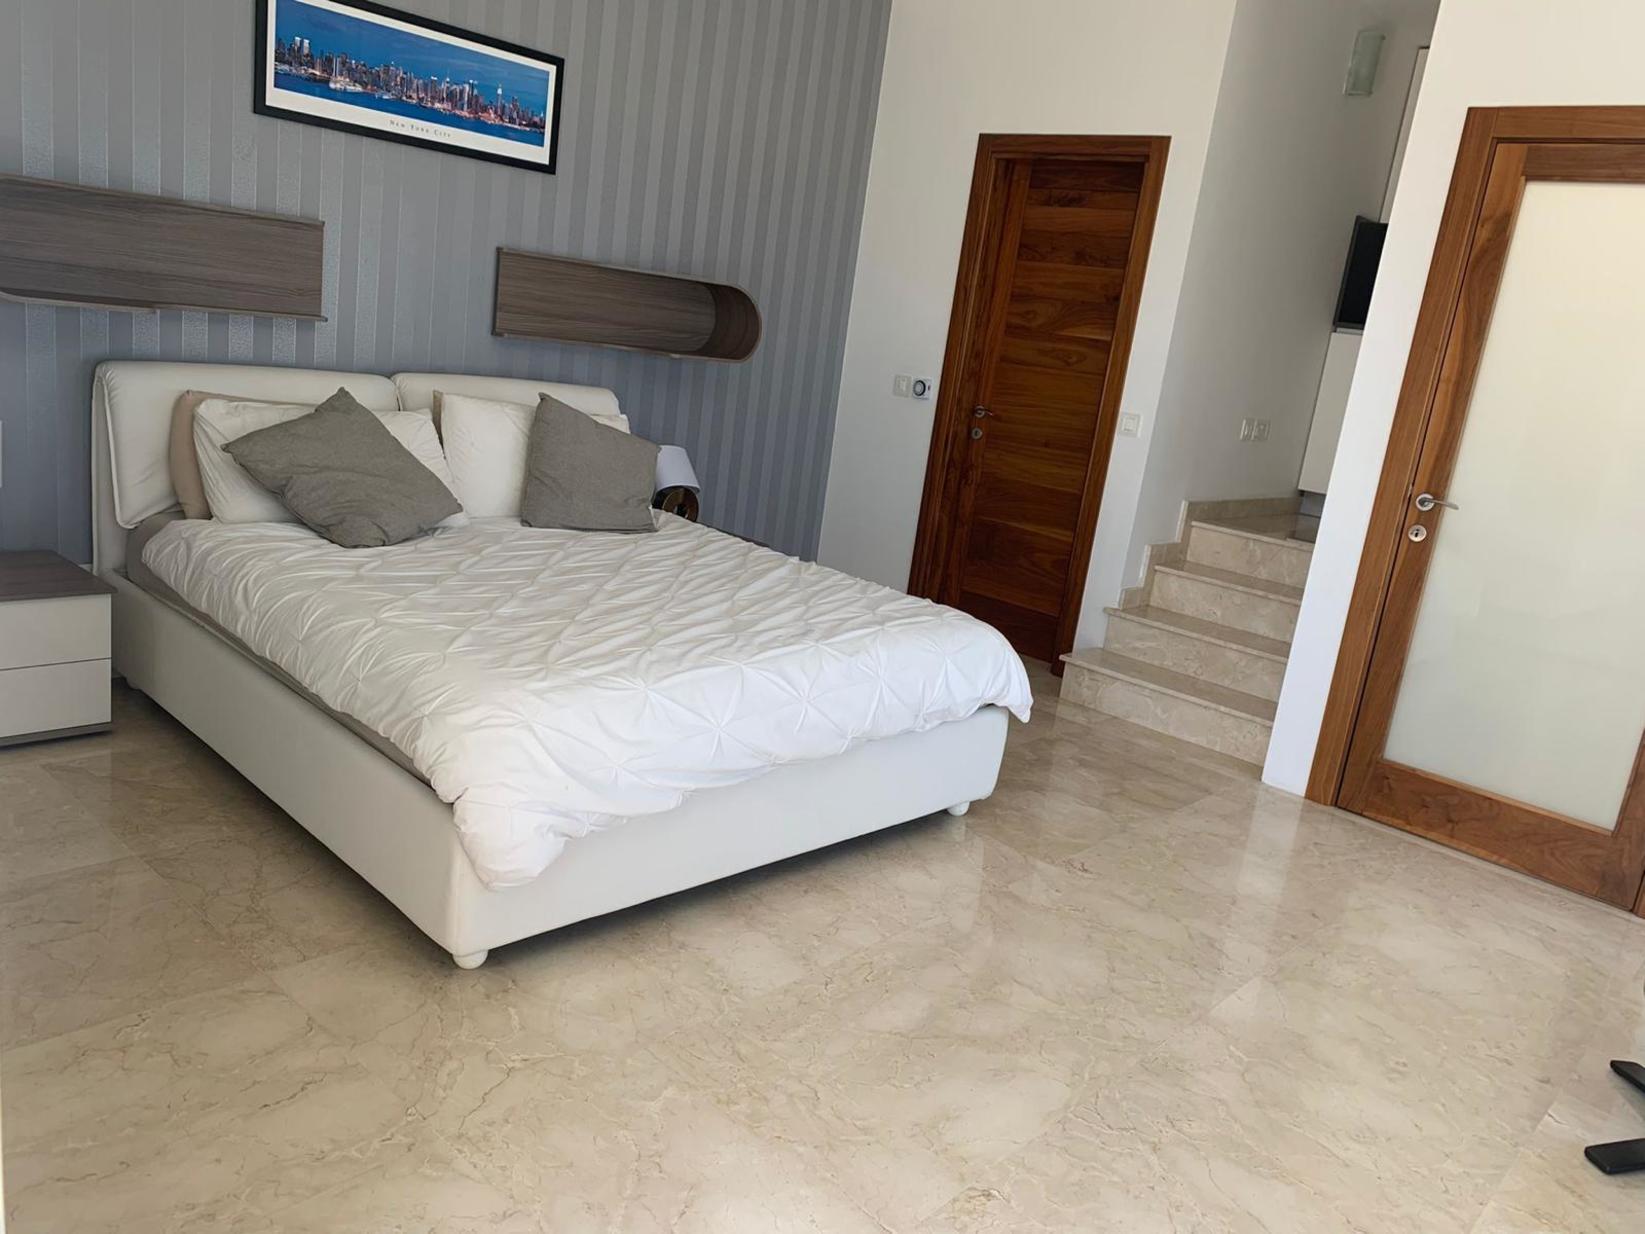 4 bed Villa For Rent in Ibragg, Ibragg - thumb 9